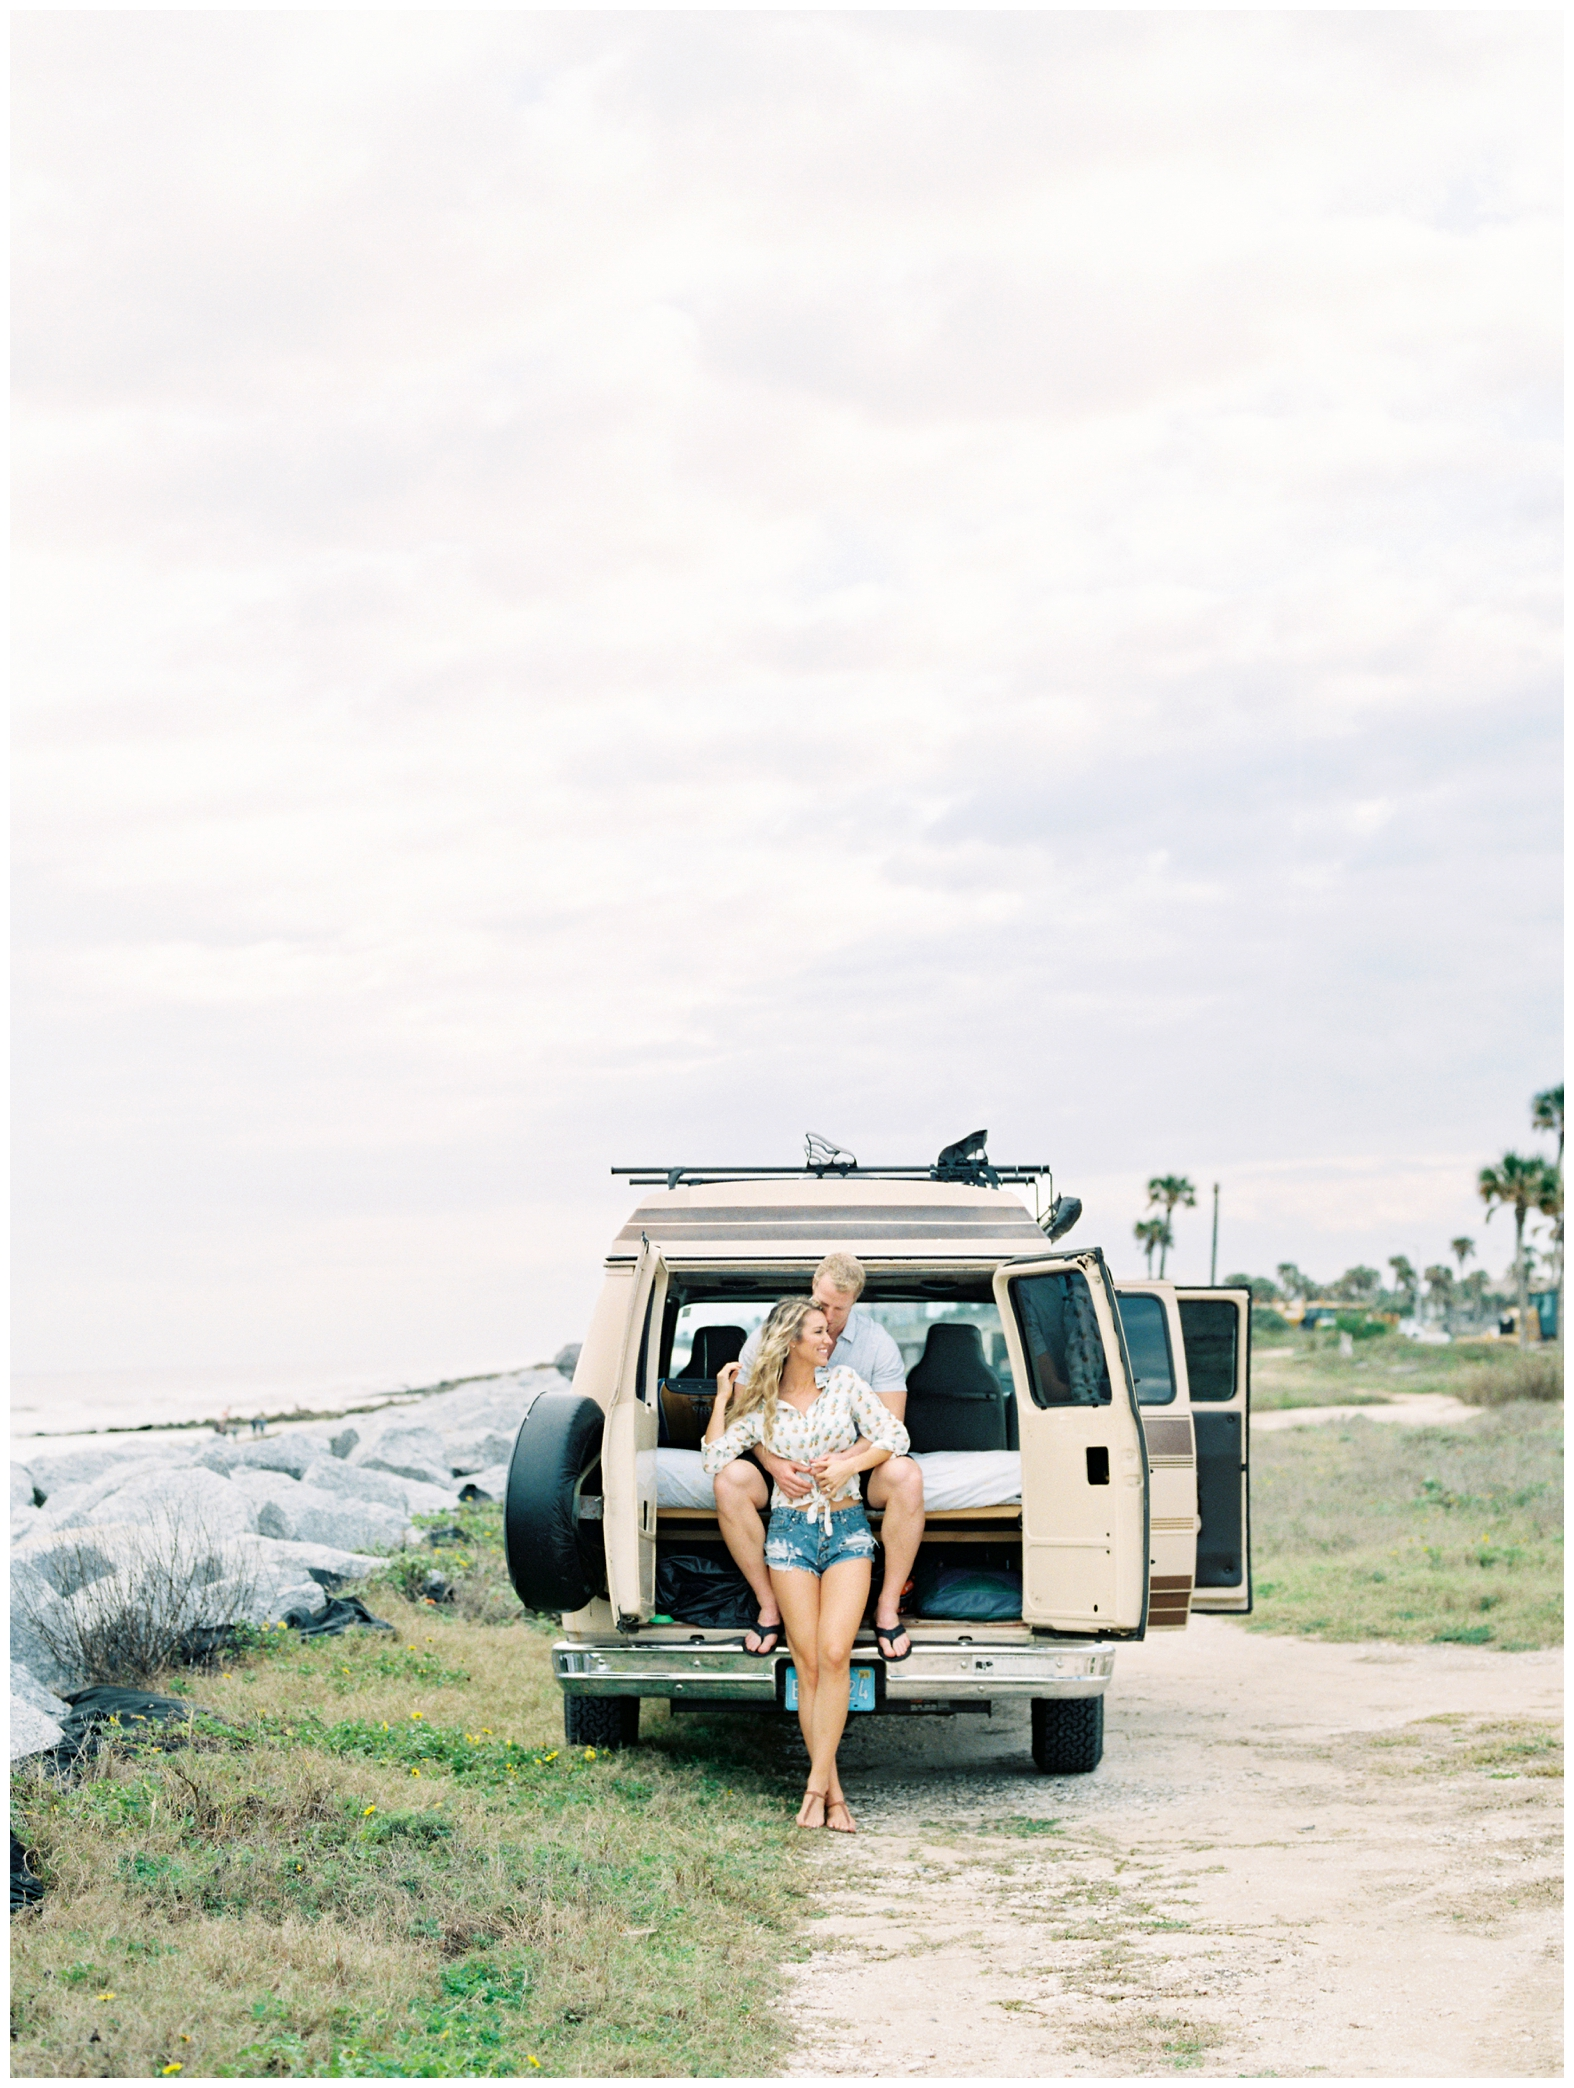 Lisa Silva Photography -Beachy Lifestyle Engagement Session in Palm Coast Florida - Jacksonville Film Photograpgers_0003.jpg